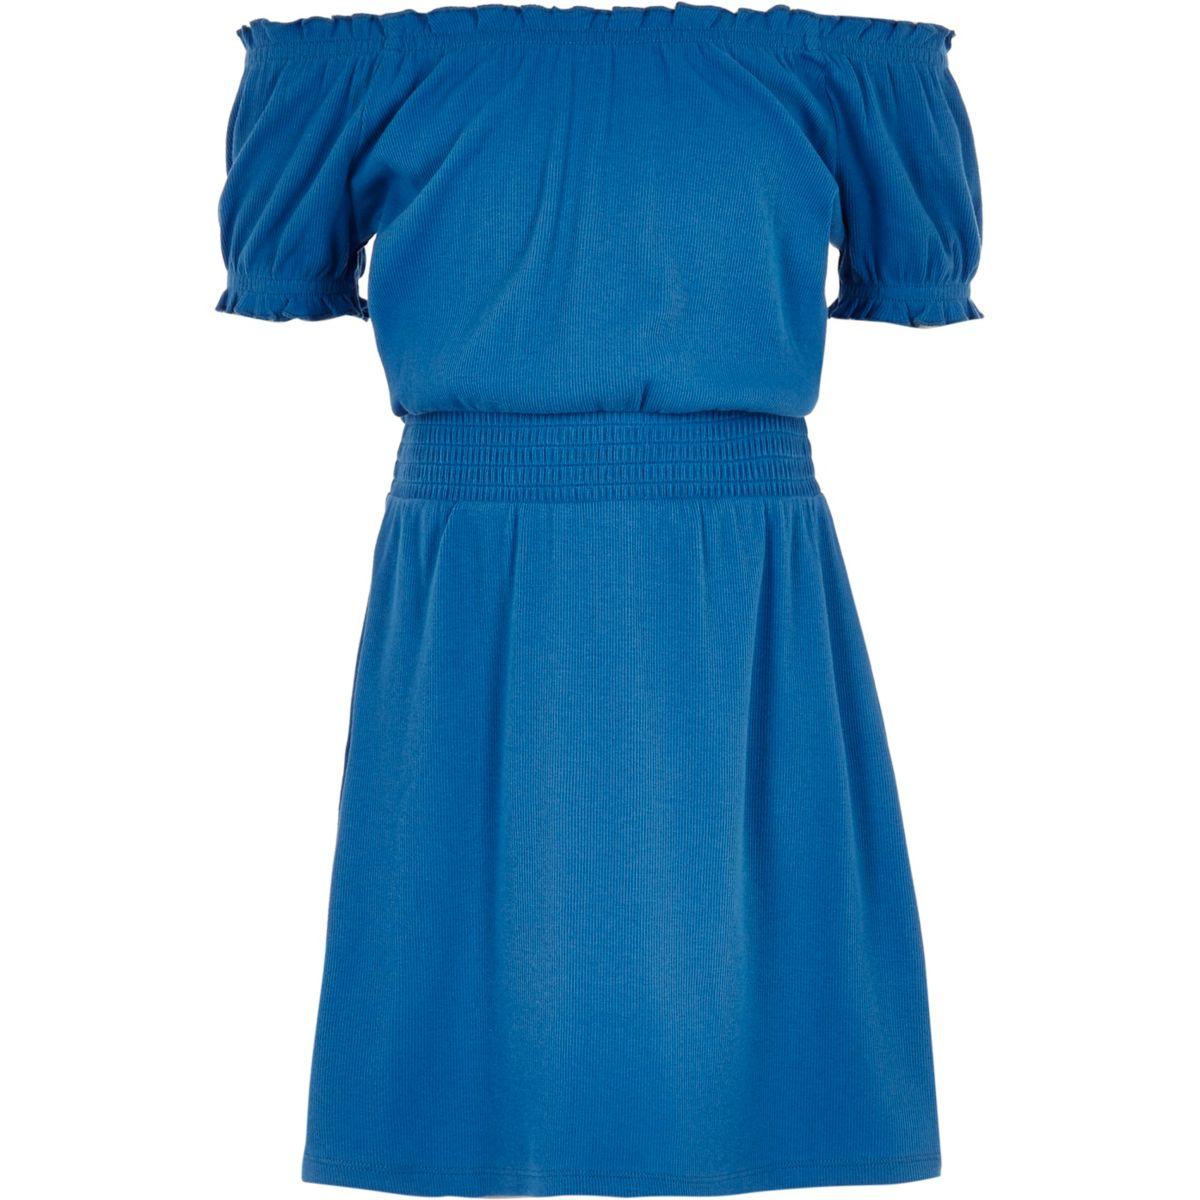 Robe Bardot bleue froncée pour fille